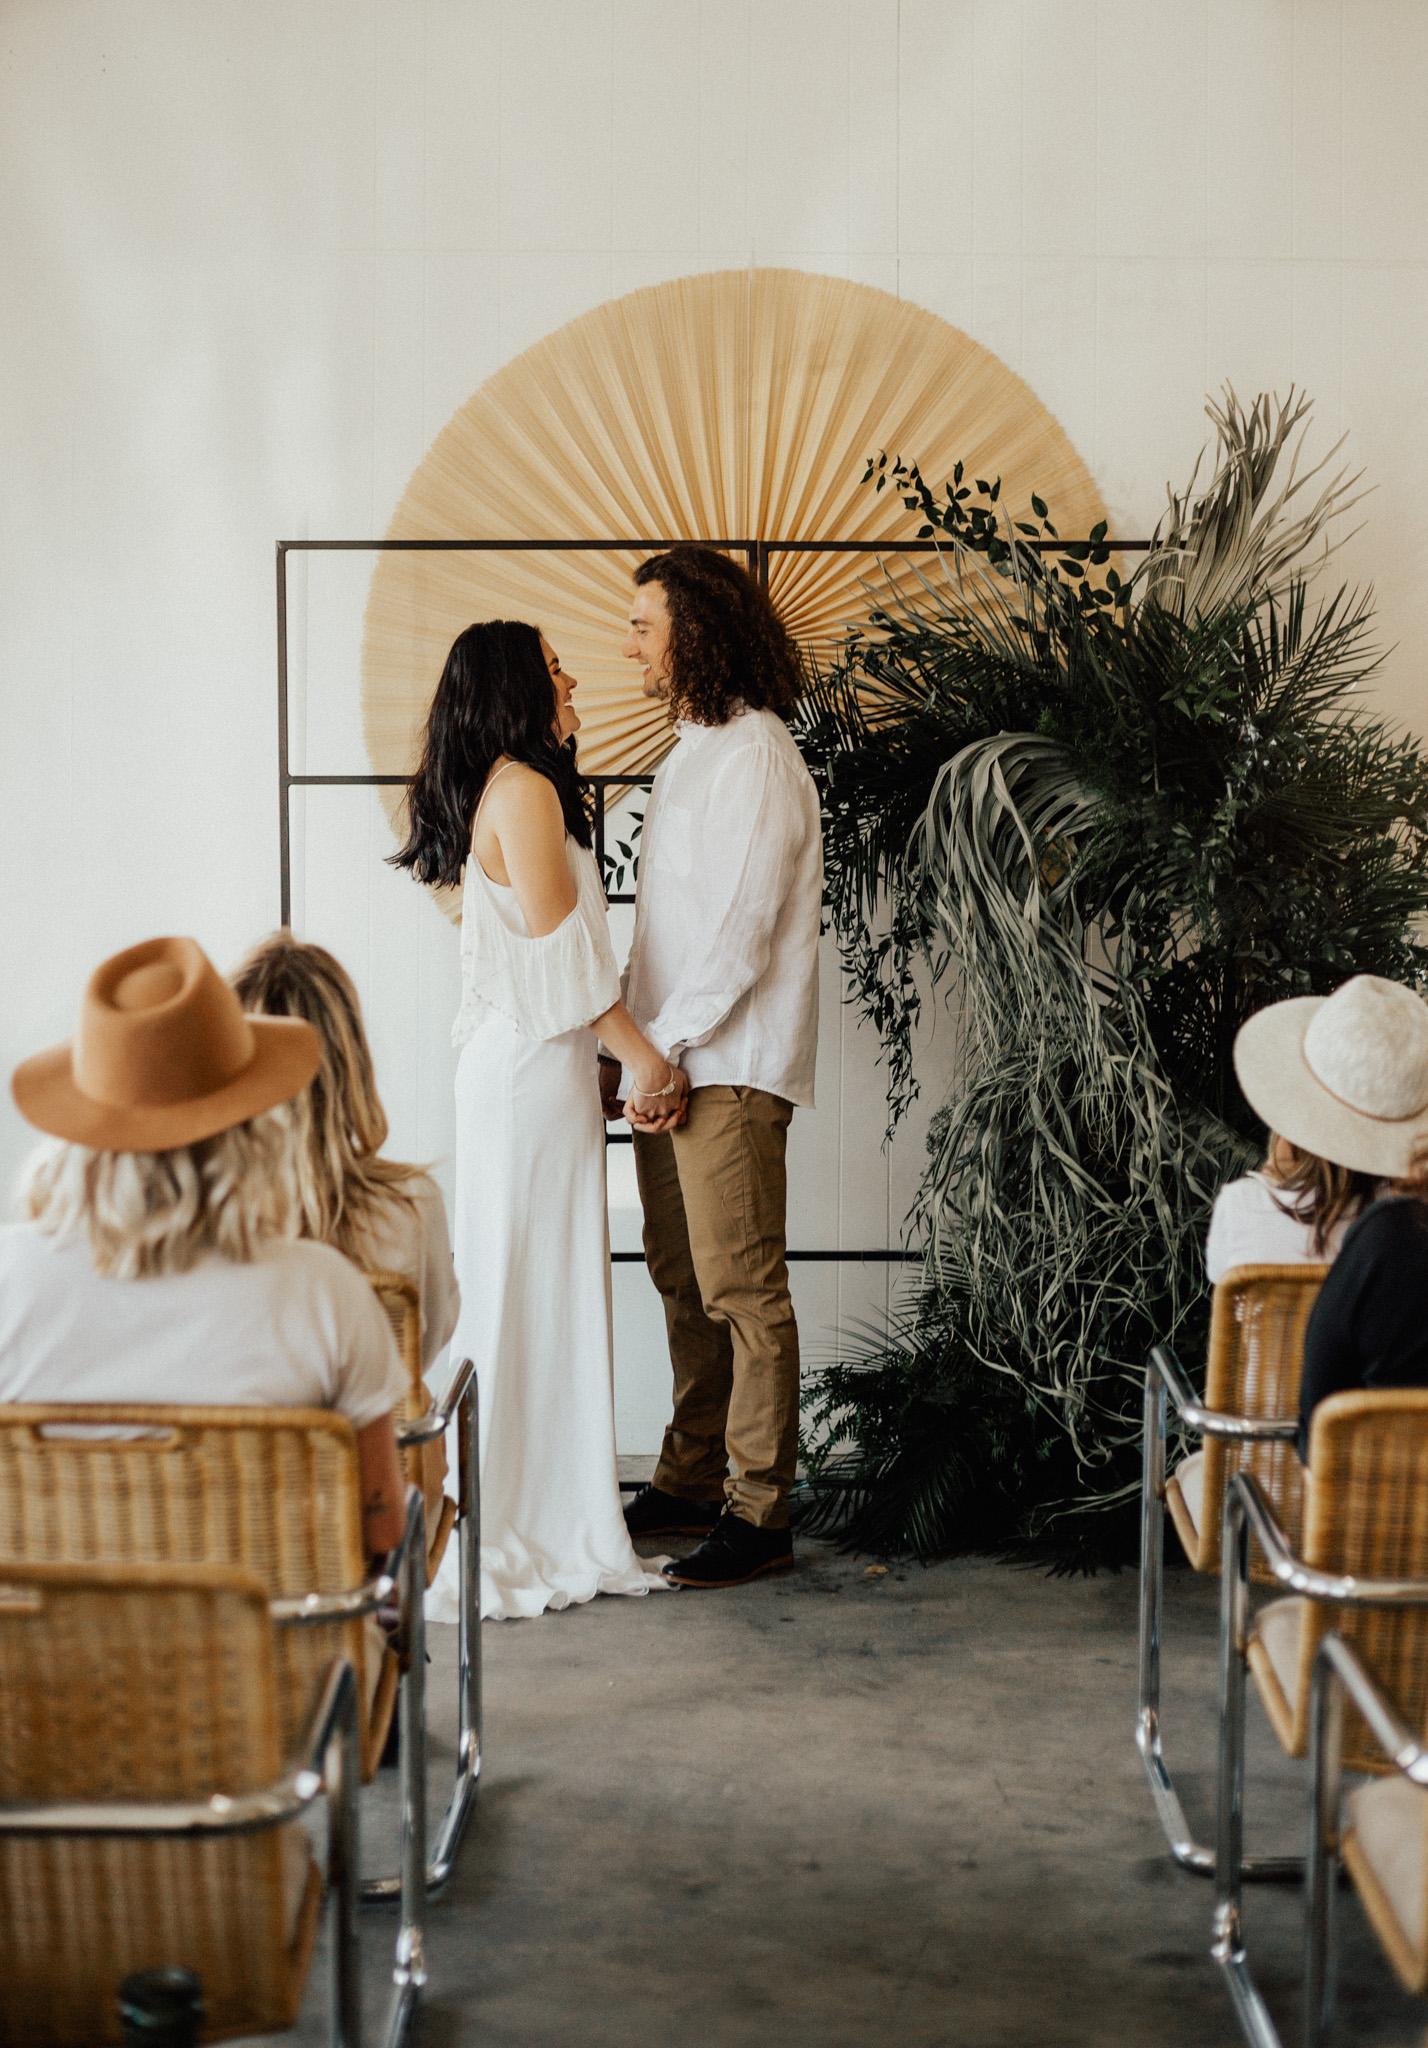 Bali_Inspired_Wedding-170.jpg